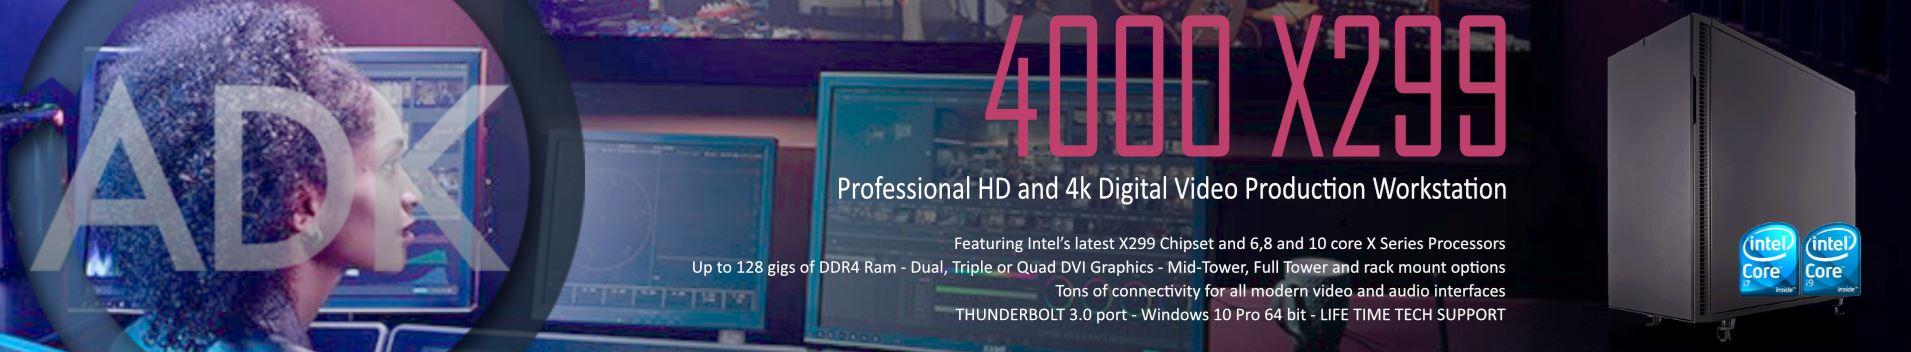 Powerhouse HD, 4k, Motion Graphics Digital Video Workstation. Based on Intel's latest x299 chipset